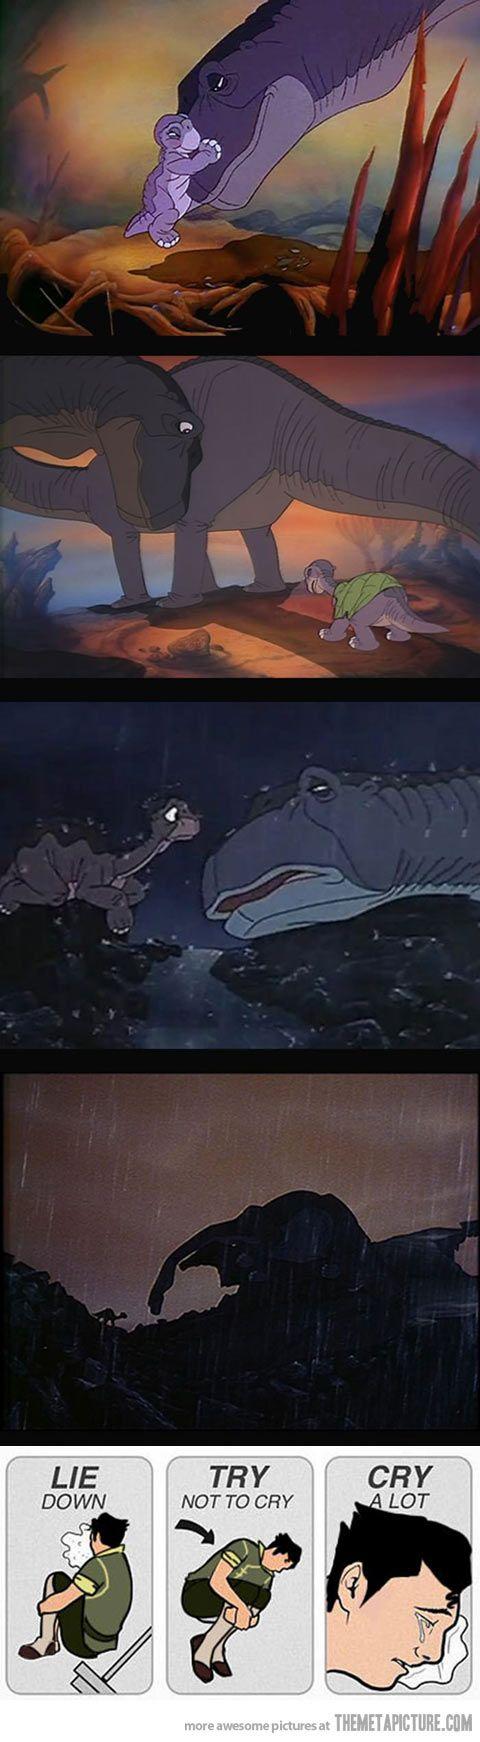 Kids movies make me cry